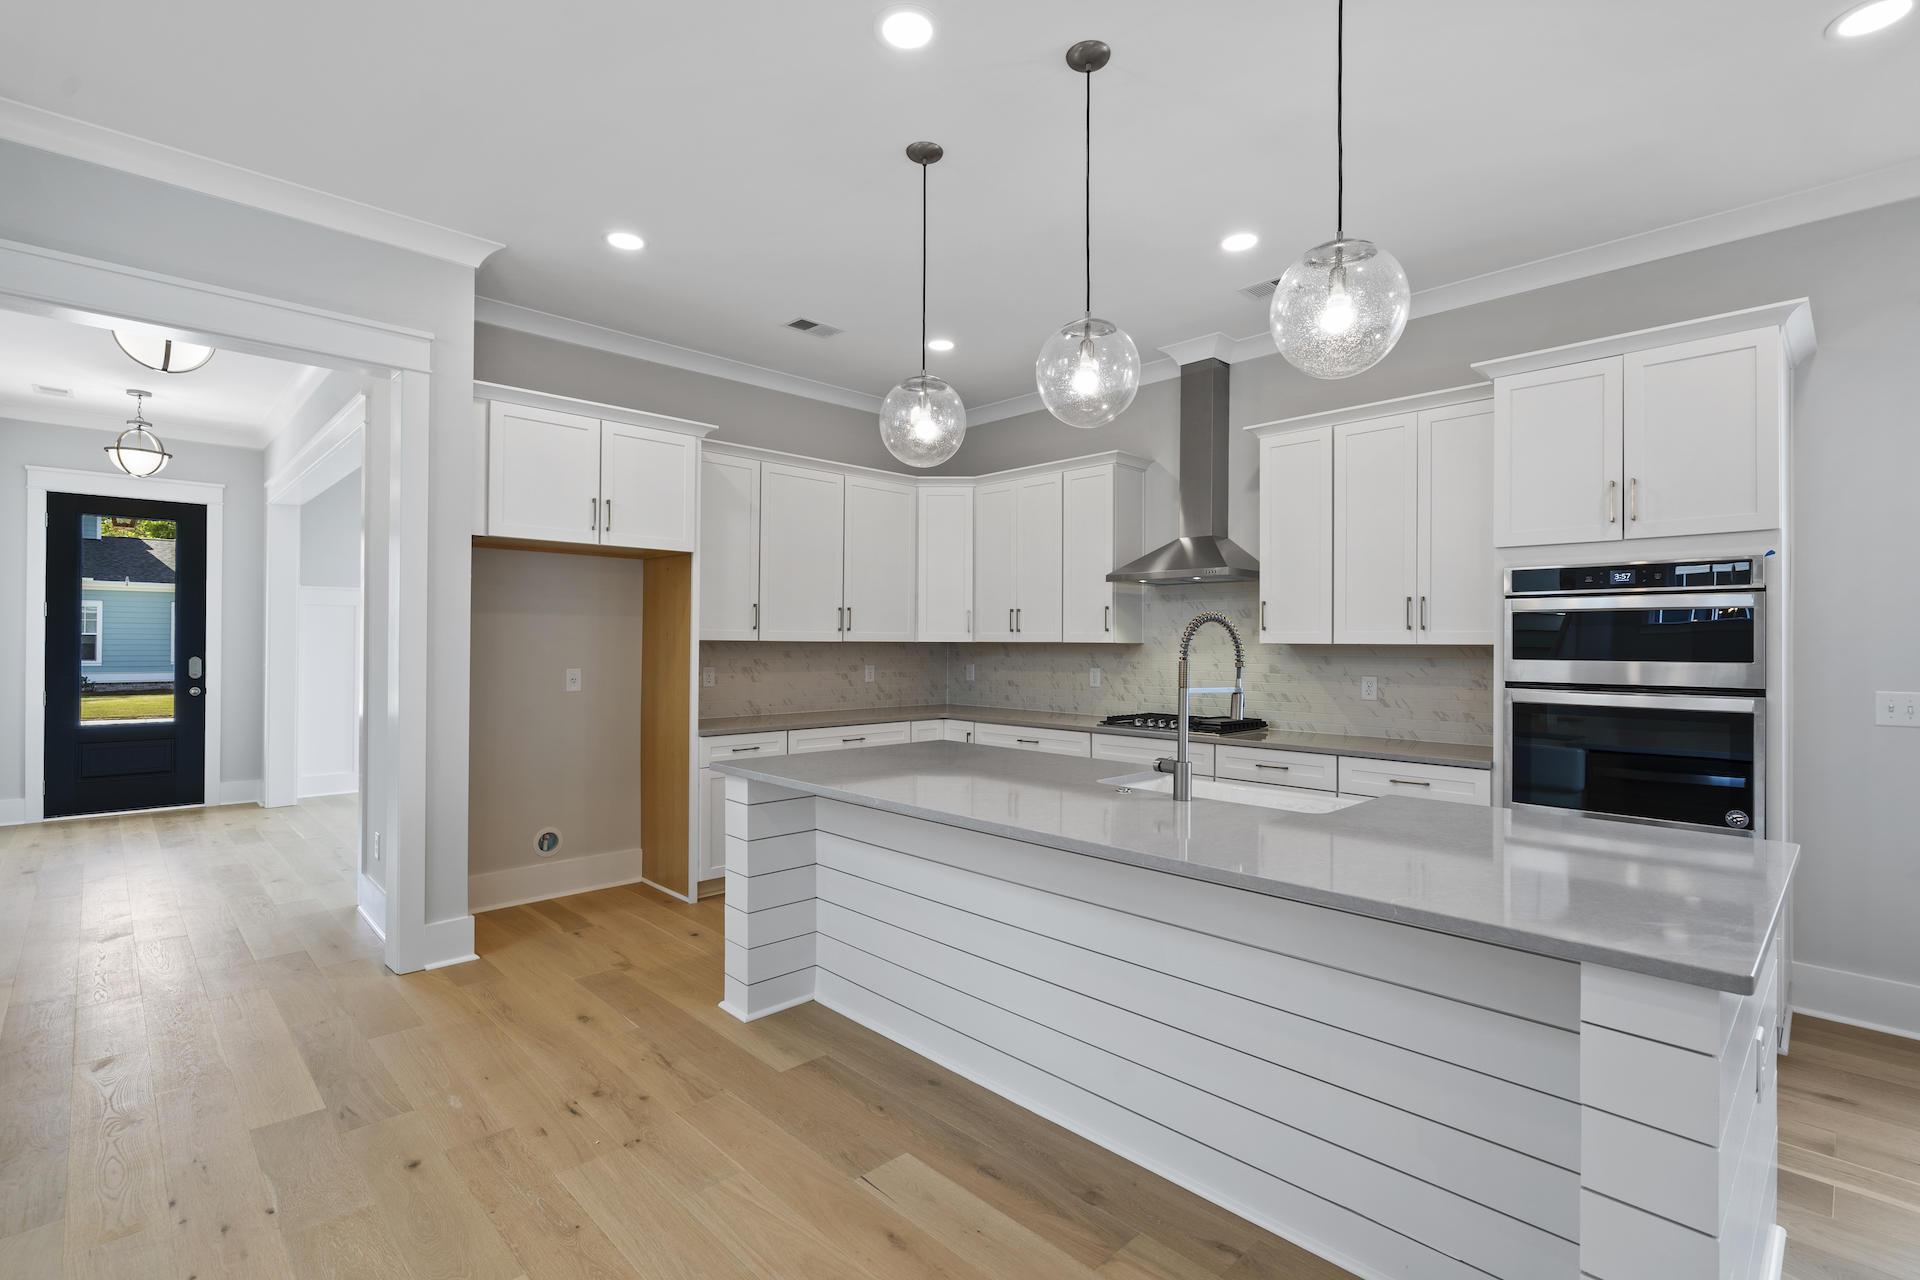 Midtown Homes For Sale - 1328 Upper Union, Mount Pleasant, SC - 25